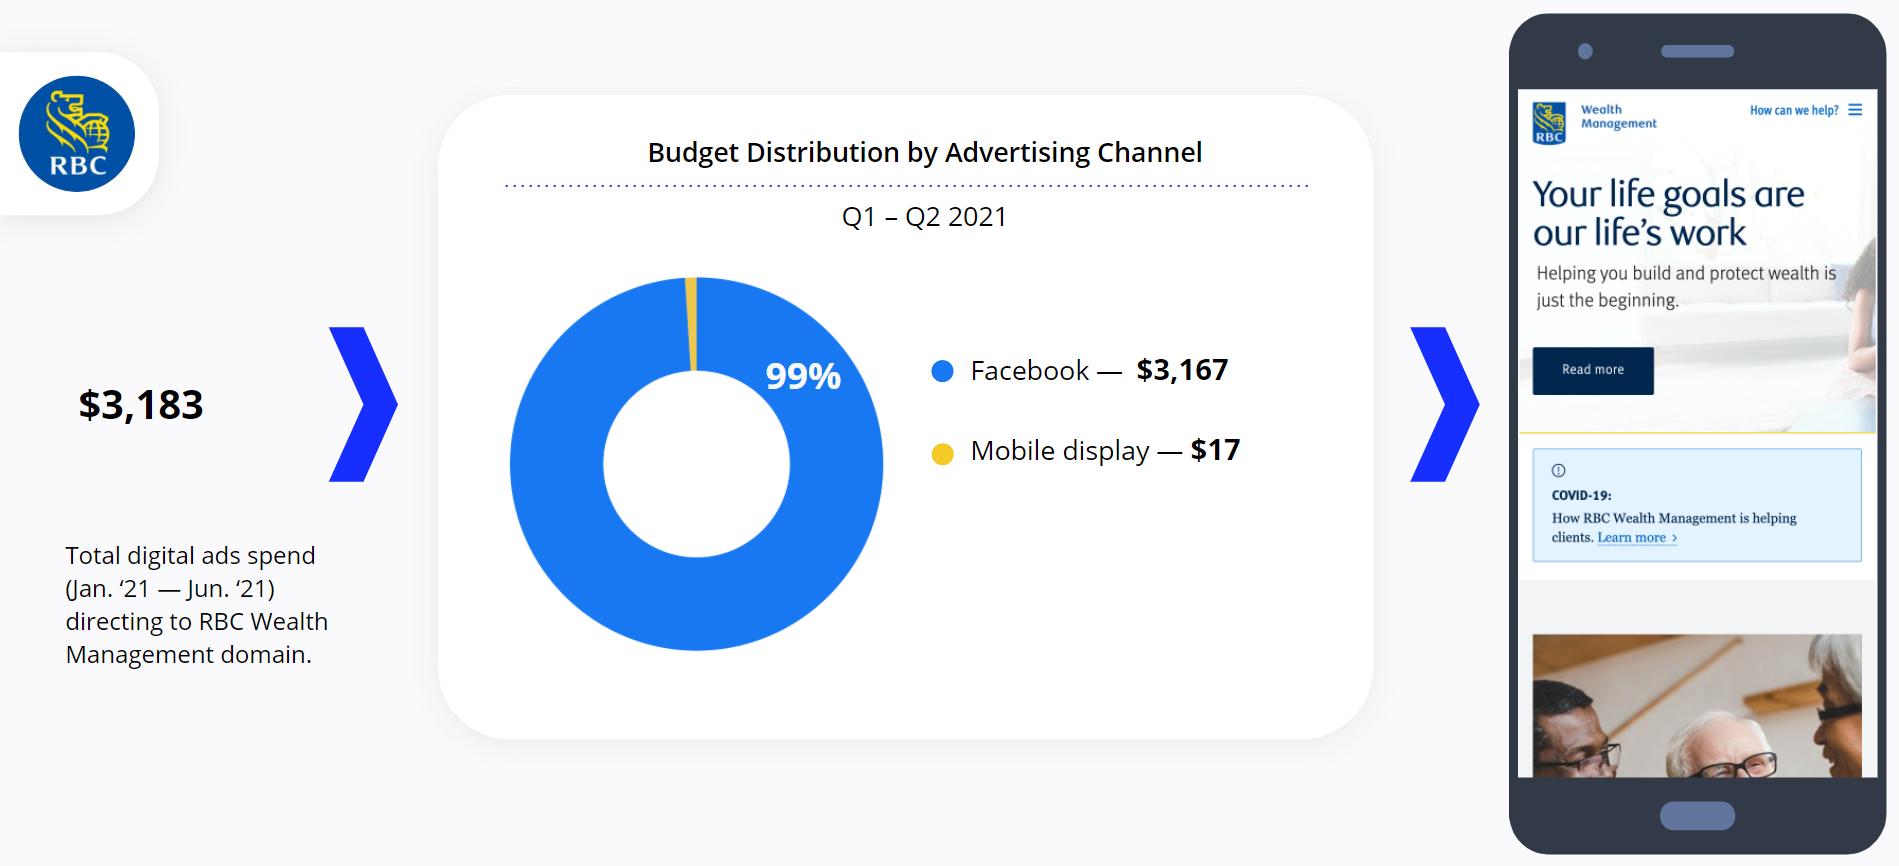 RBC - Digital Ads Spend